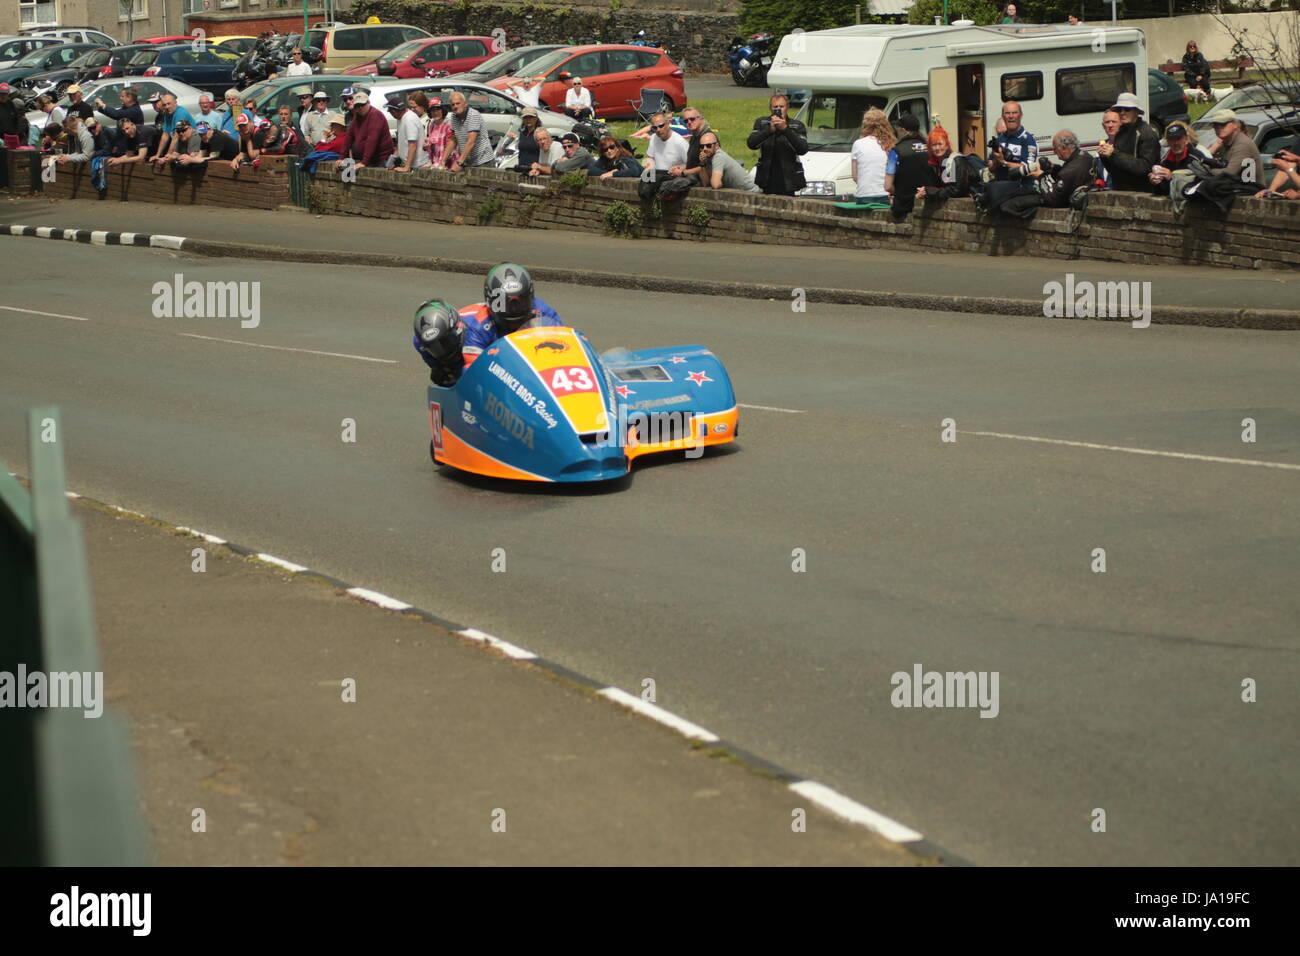 Isle of Man TT Races, Sidecar Qualifying Practice Race, Saturday 3 June 2017. Sidecar qualifying session.  Number Stock Photo